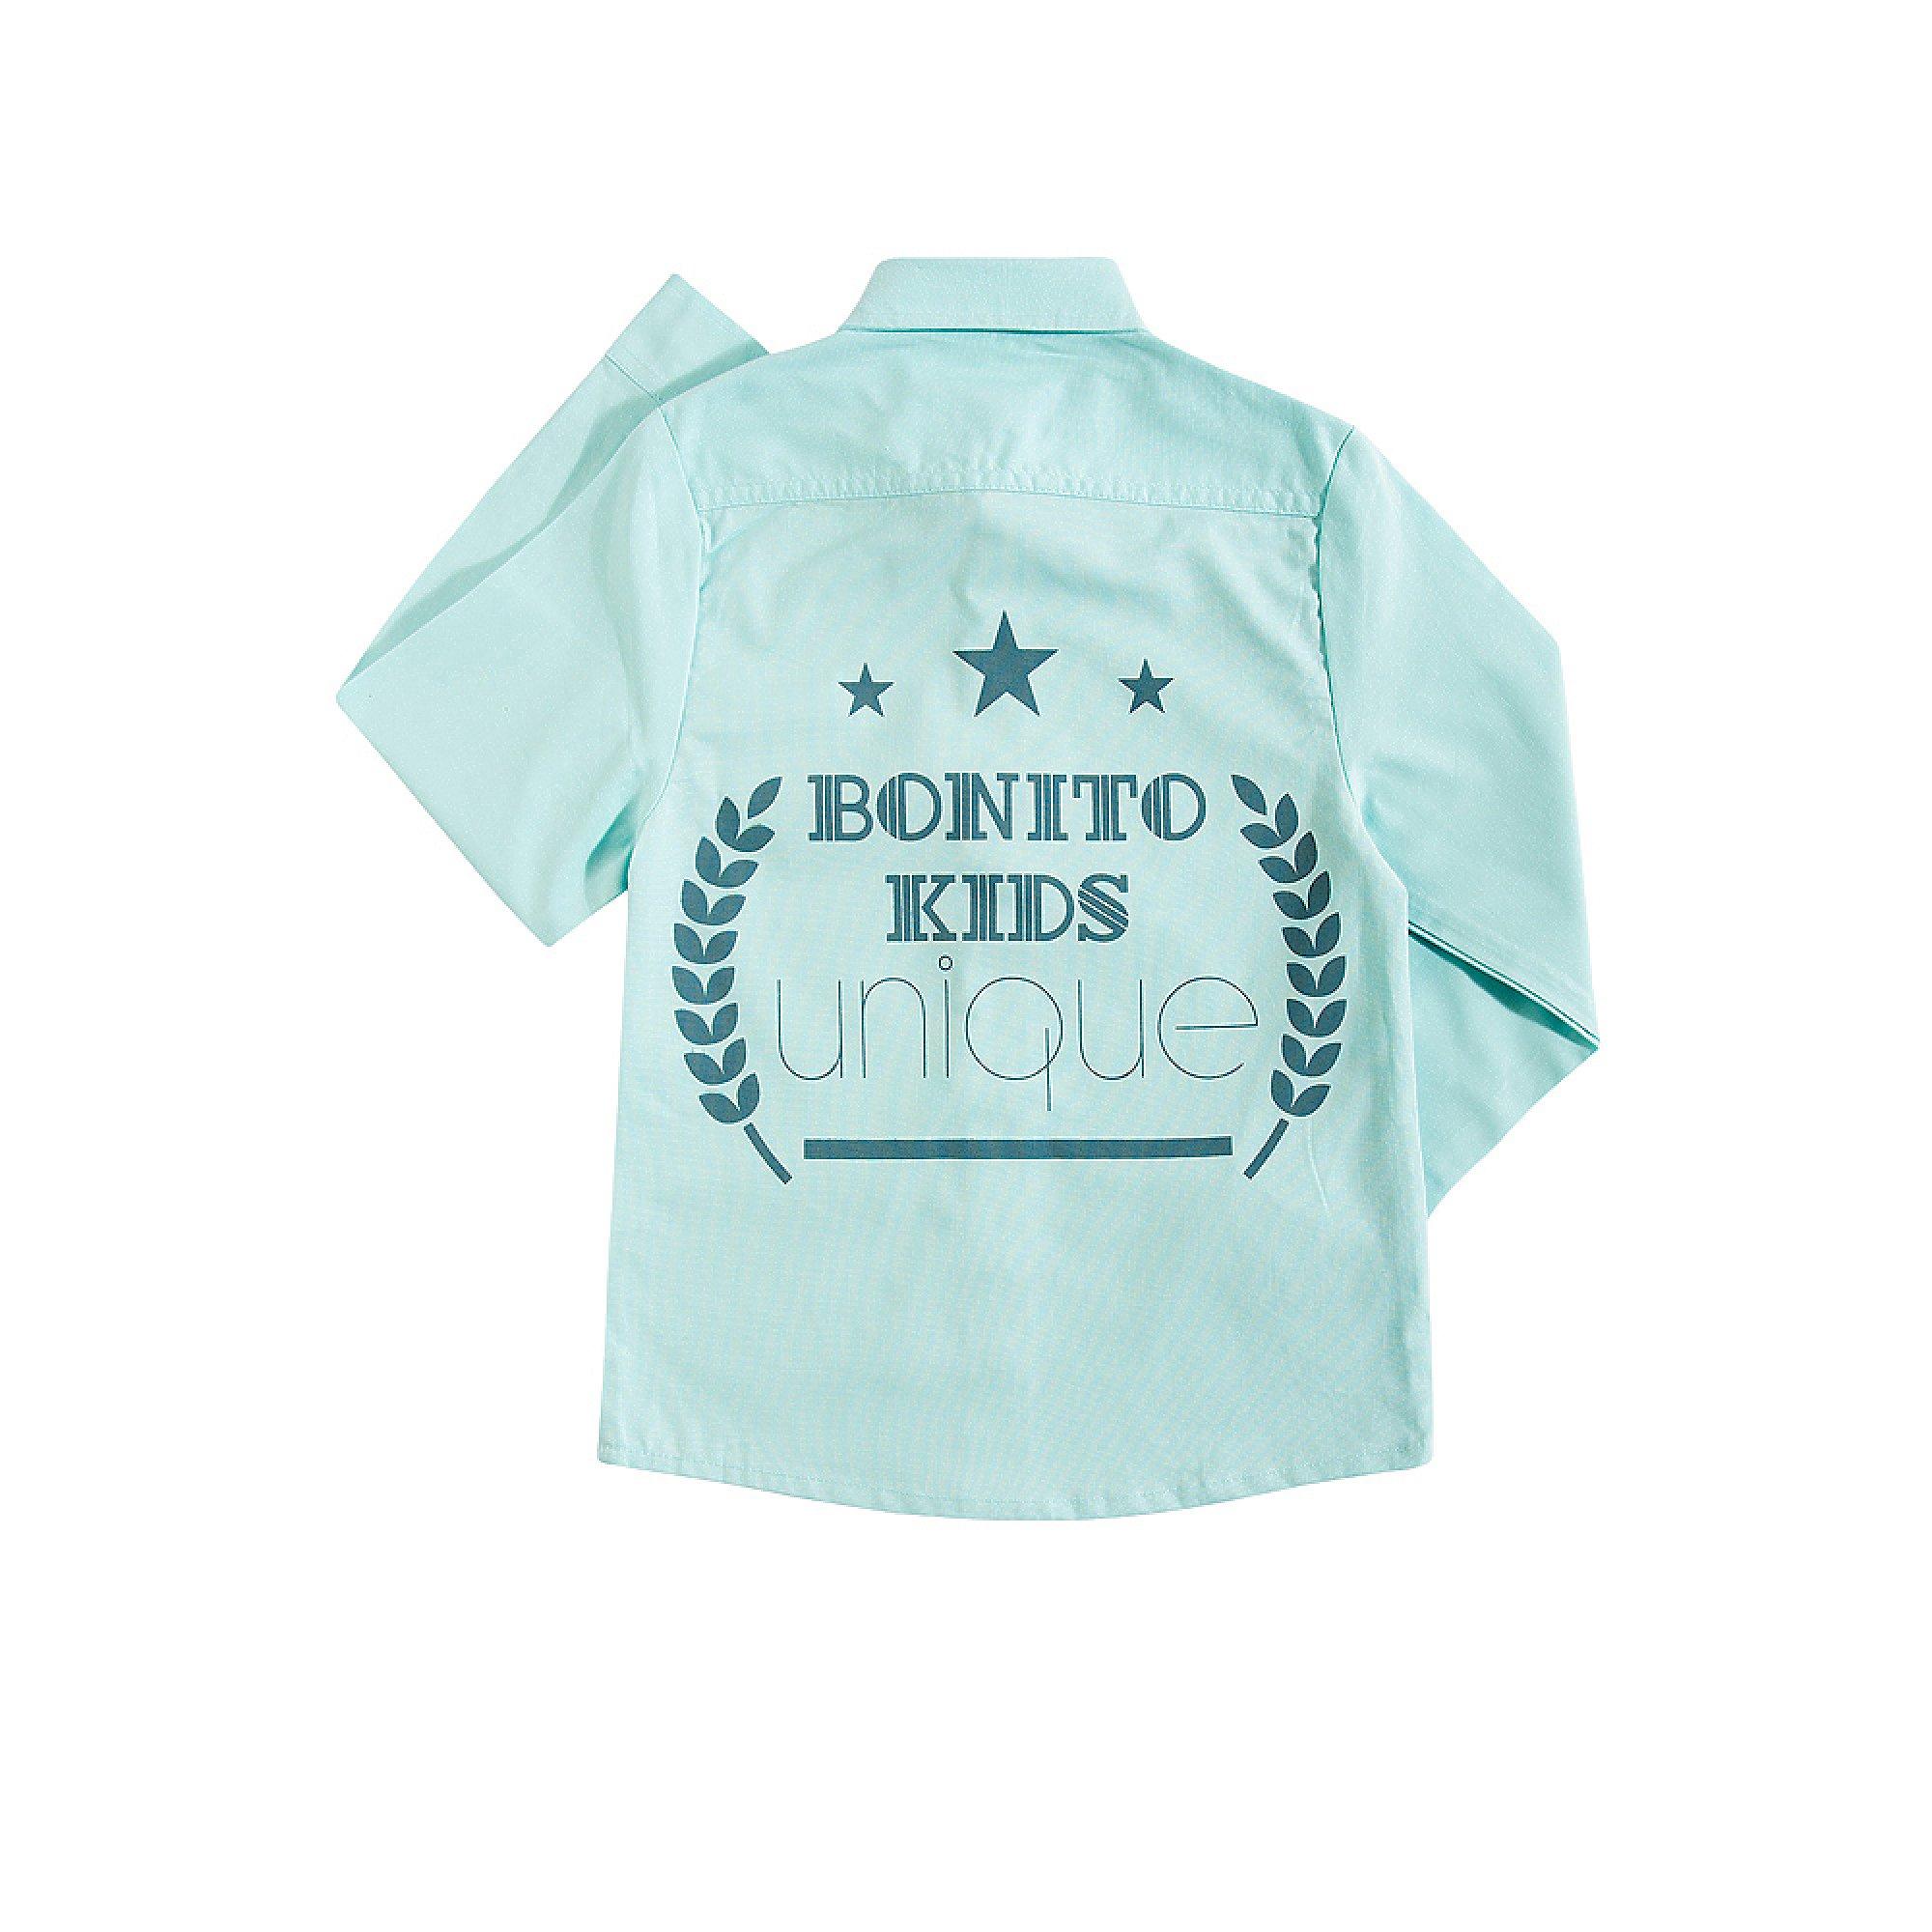 e1191616abb Рубашка для мальчика Bonito купить оптом в интернет-магазине ...